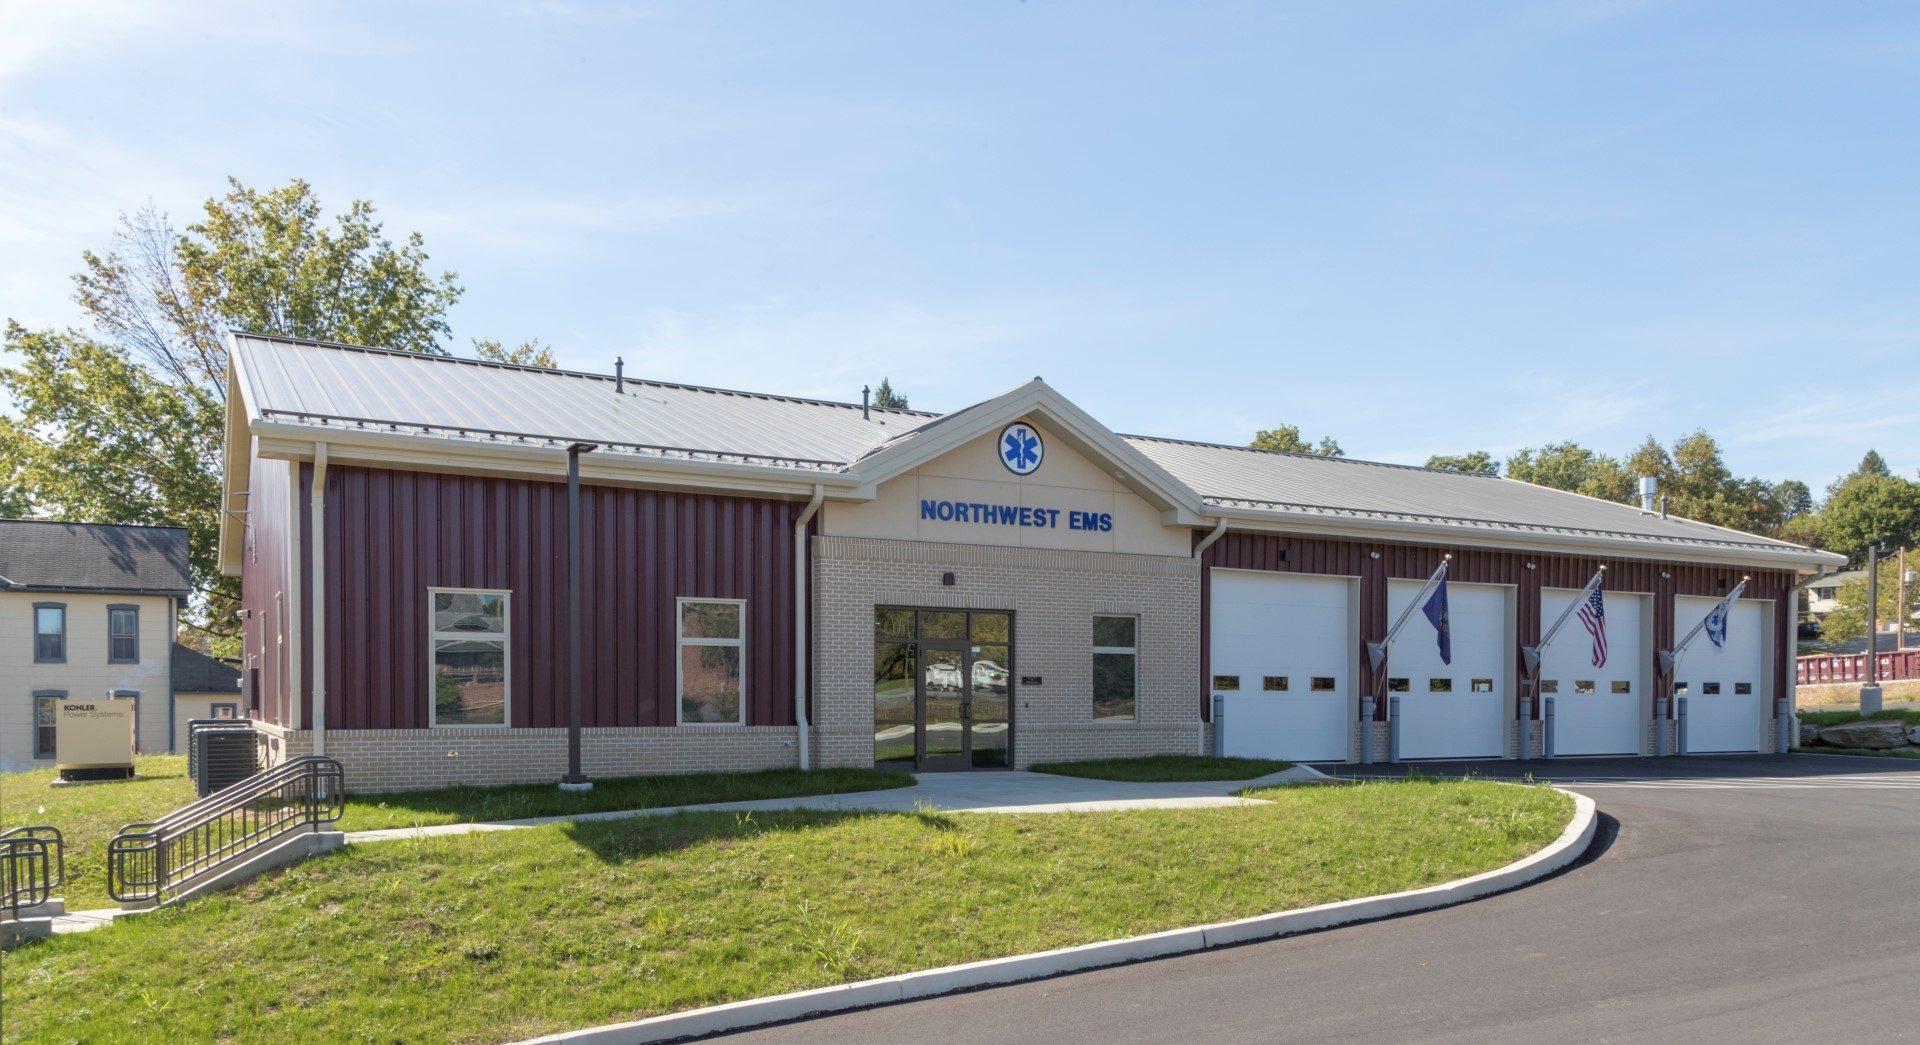 Northwest EMS 86, Manheim